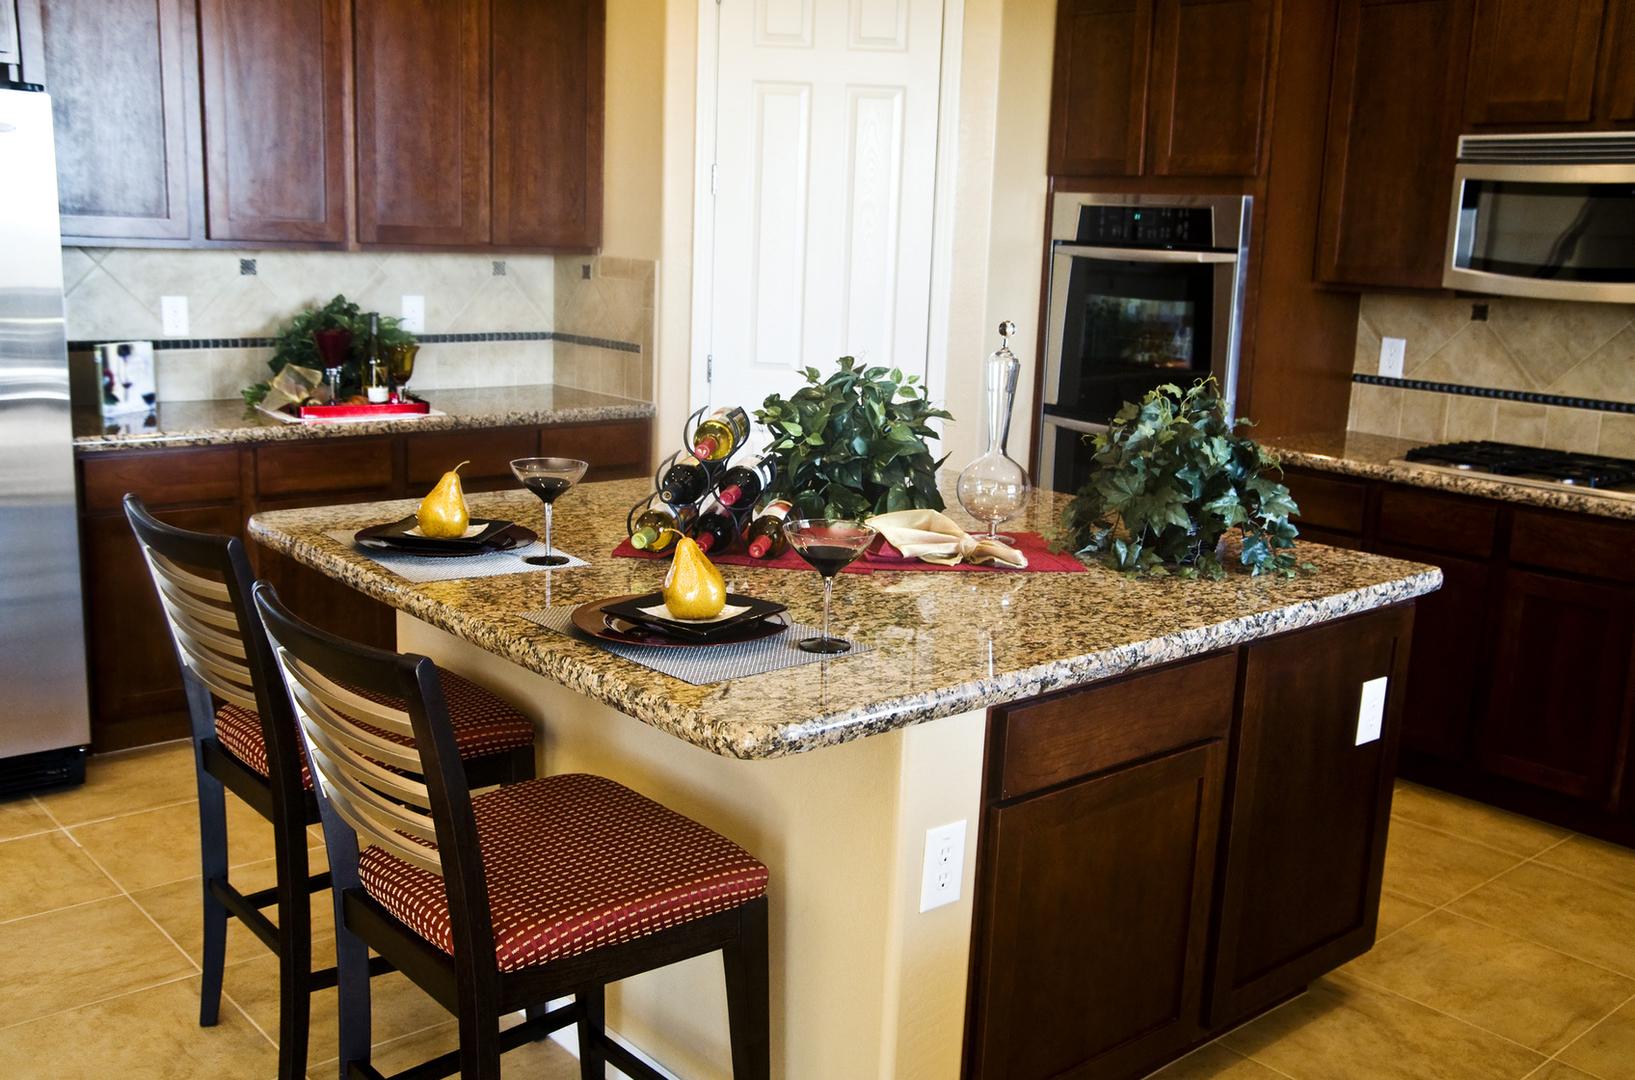 Classic espresso ready to assemble kitchen cabinets rta ship - Classic Espresso Ready To Assemble Kitchen Cabinets Rta Ship 50